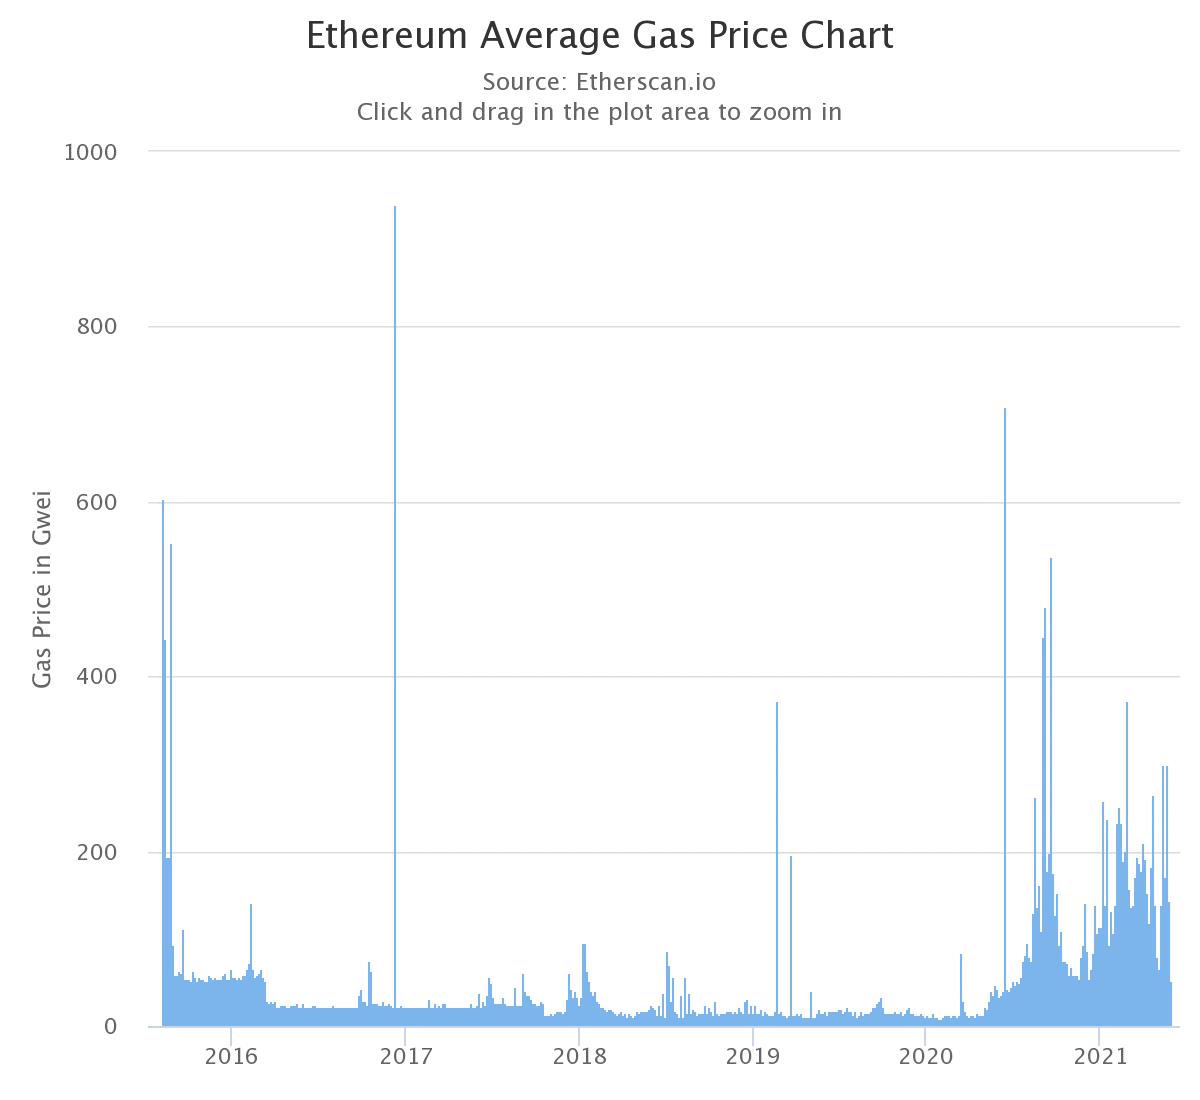 ETH Average Gas Price